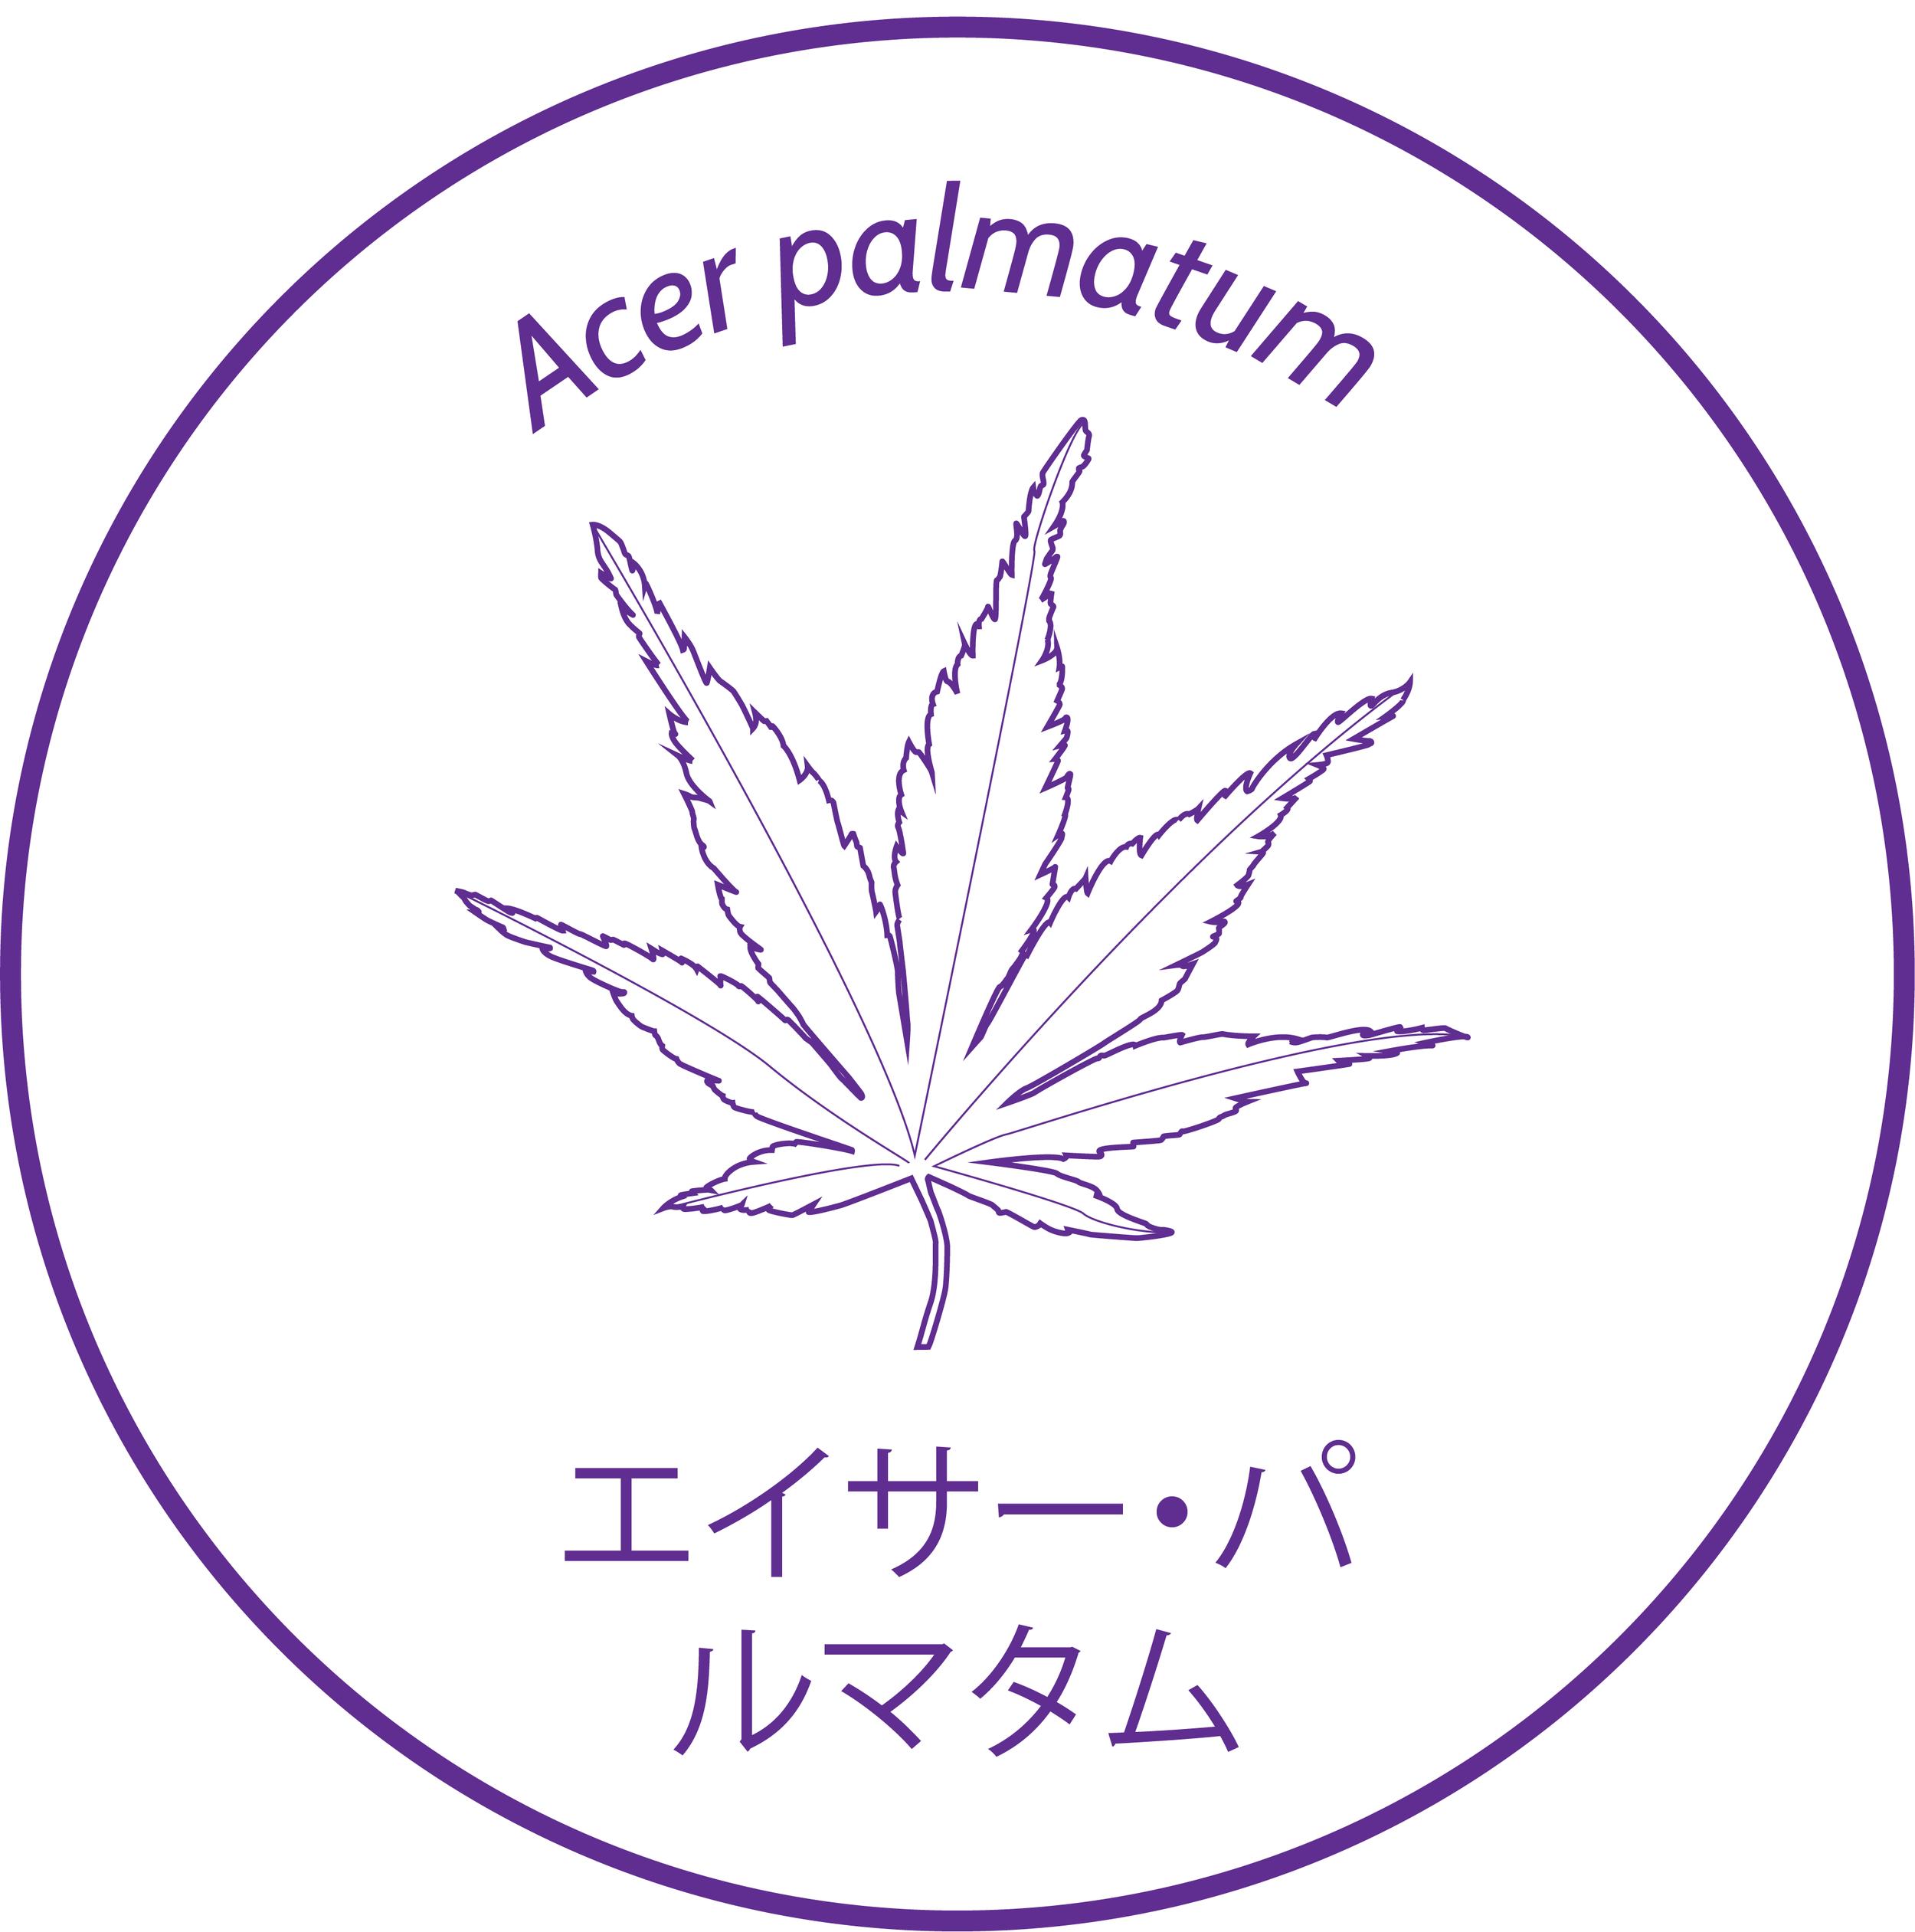 1 Acer palmatum.png